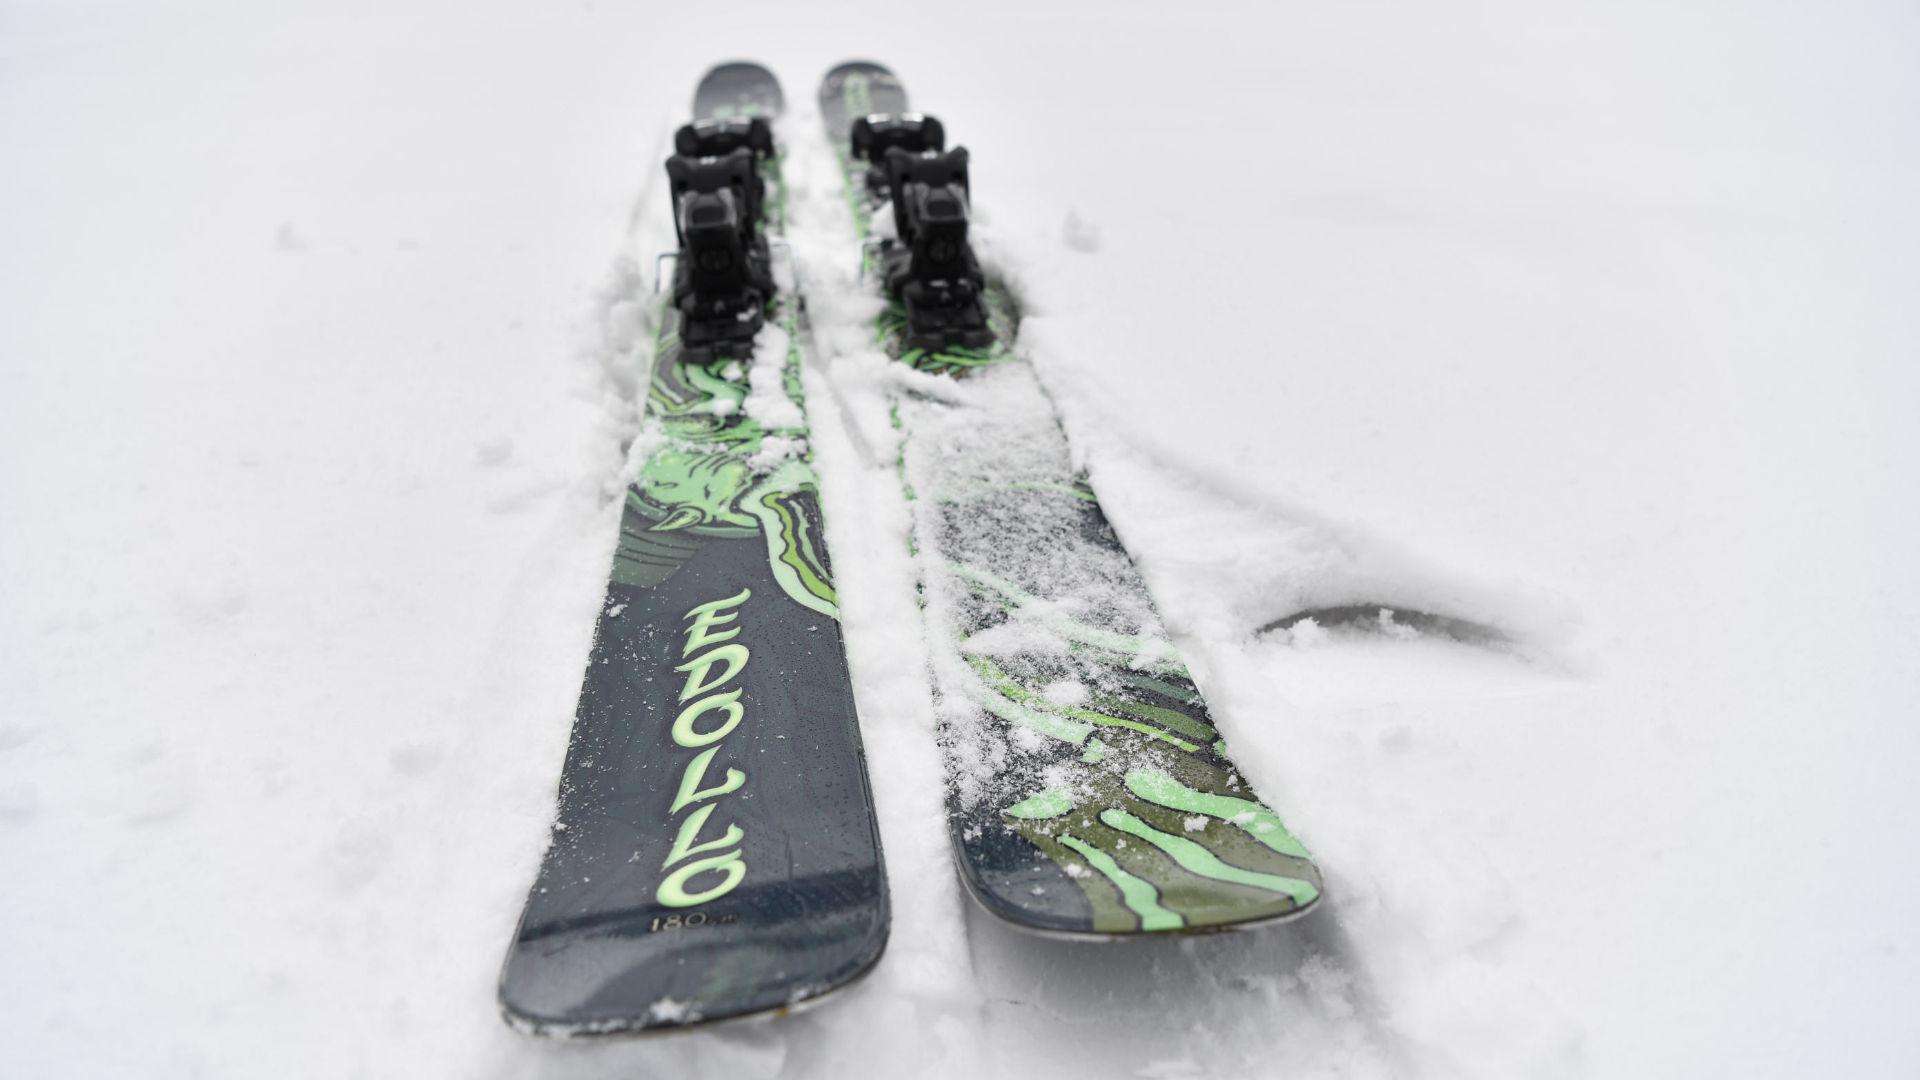 A pair of Armada Edollo ski with a 98 mm  waist